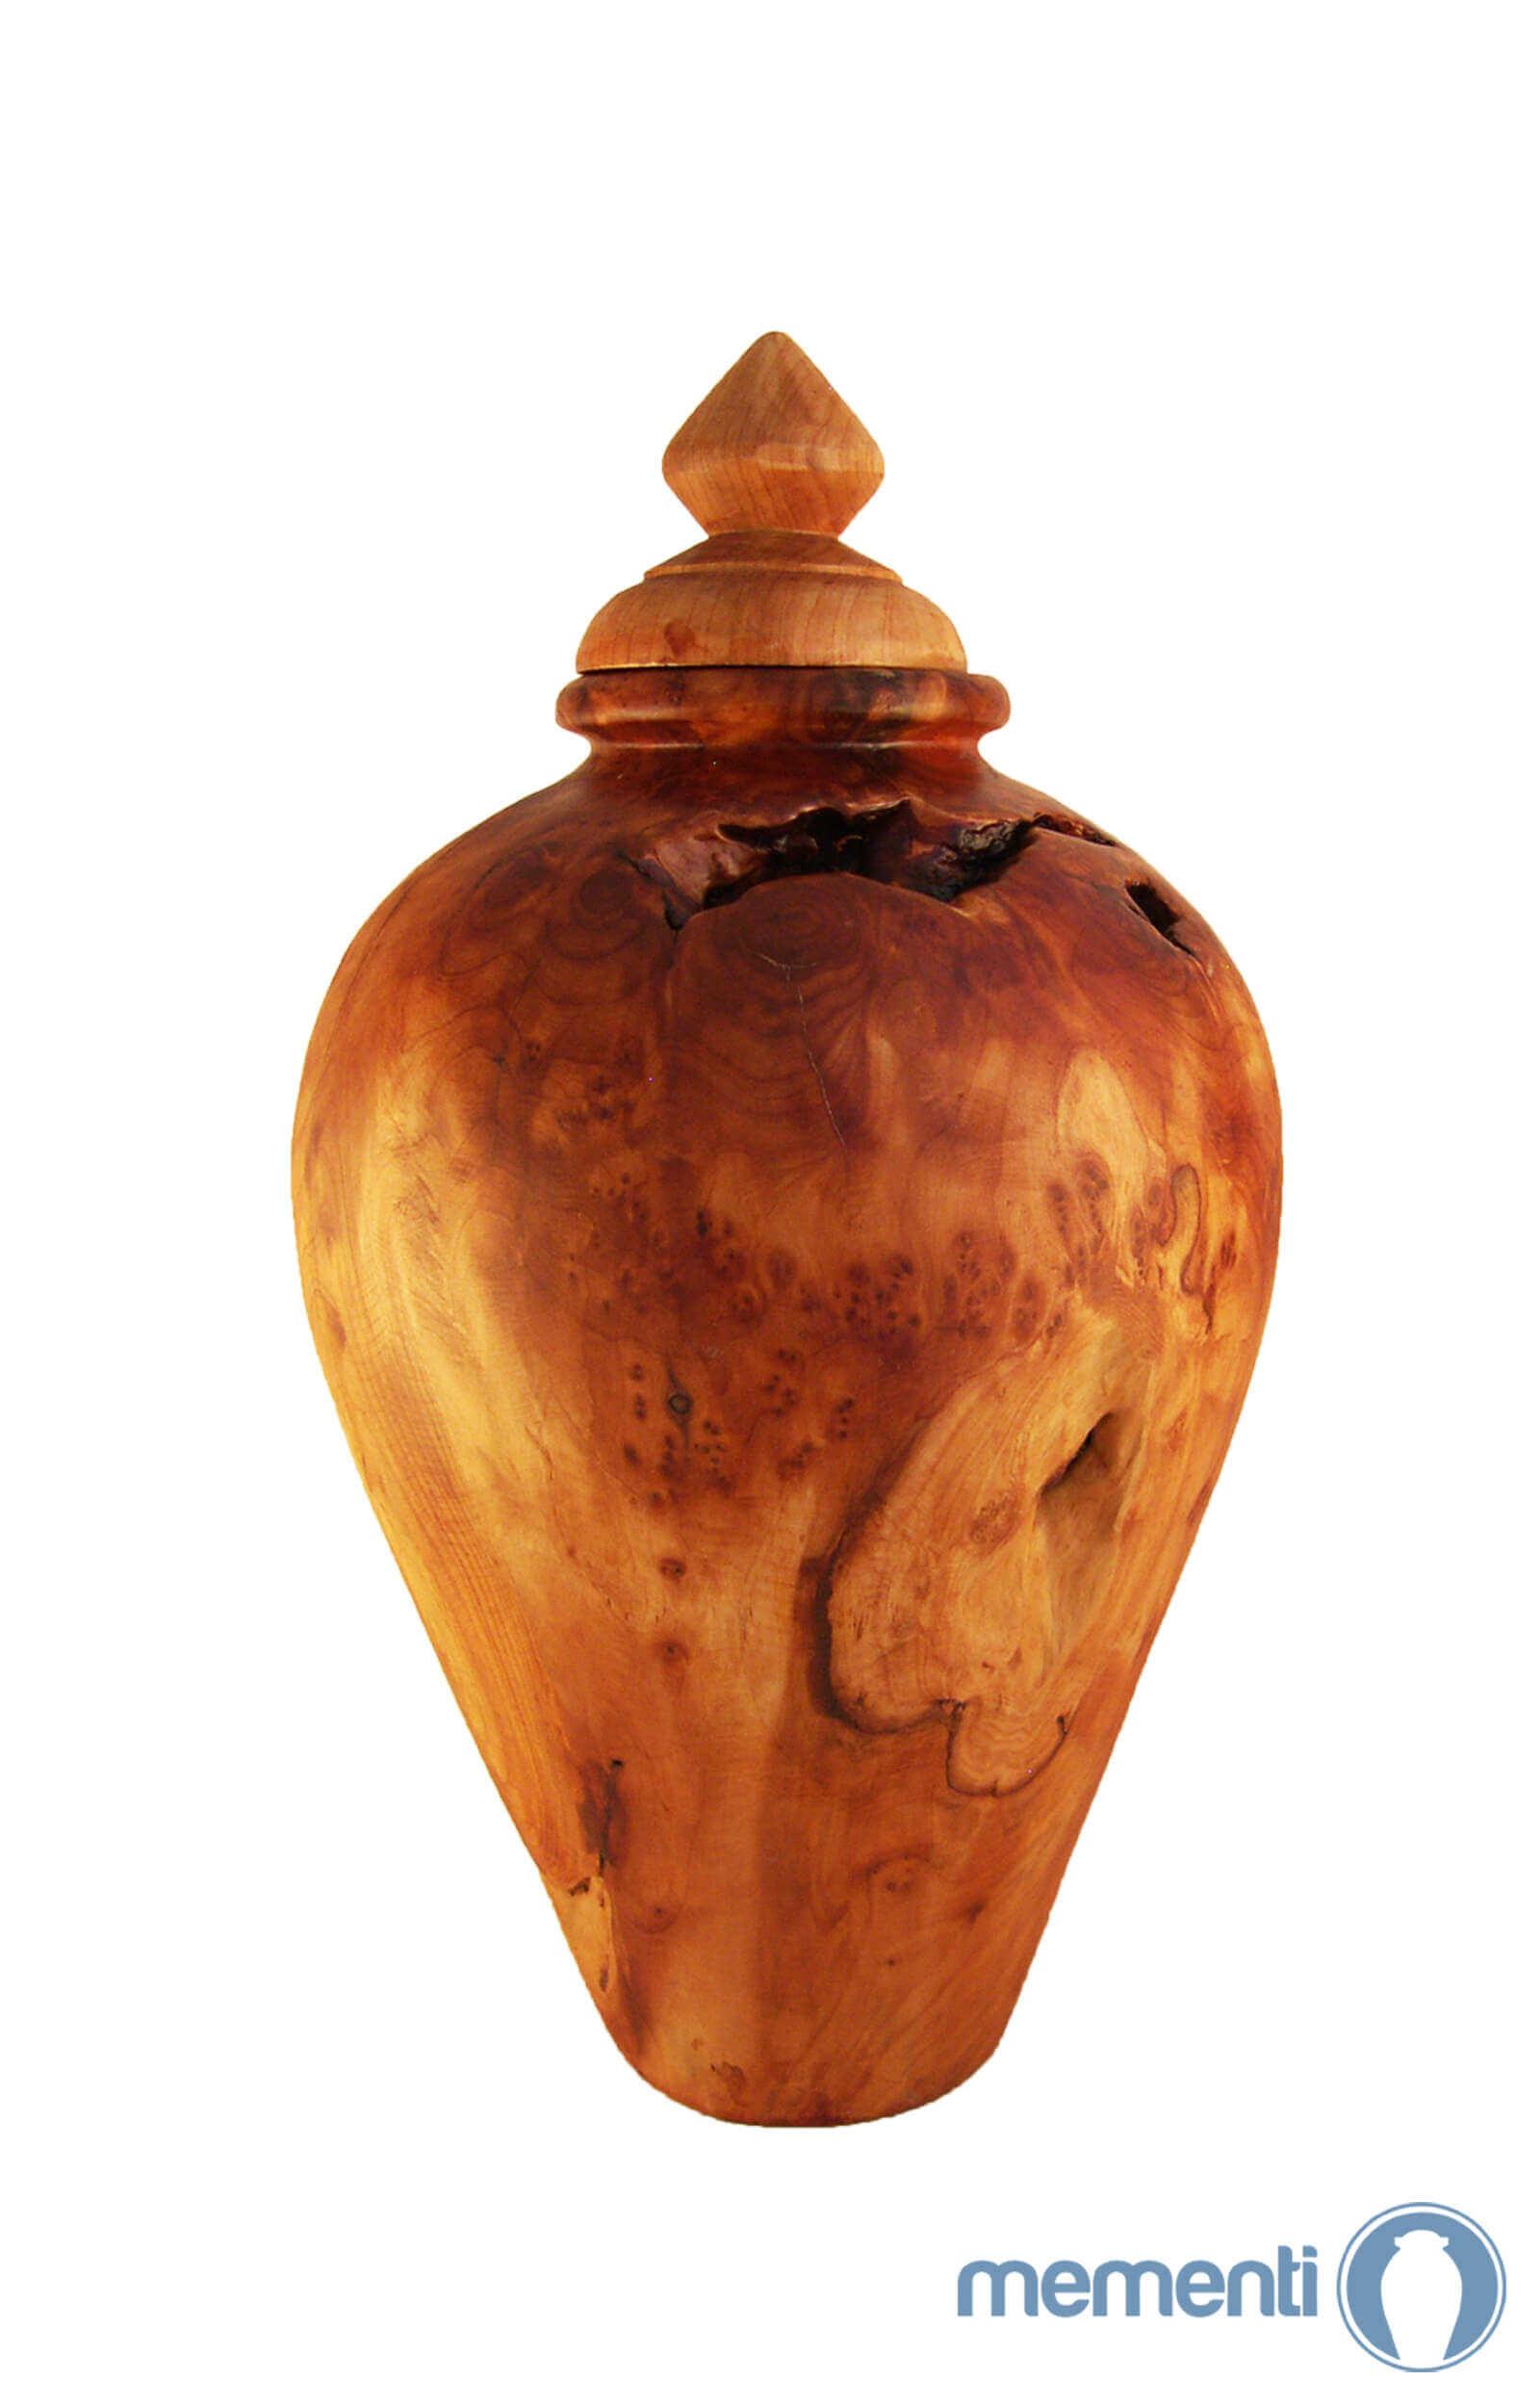 de WB1903 wurzelholz urnen kaufen